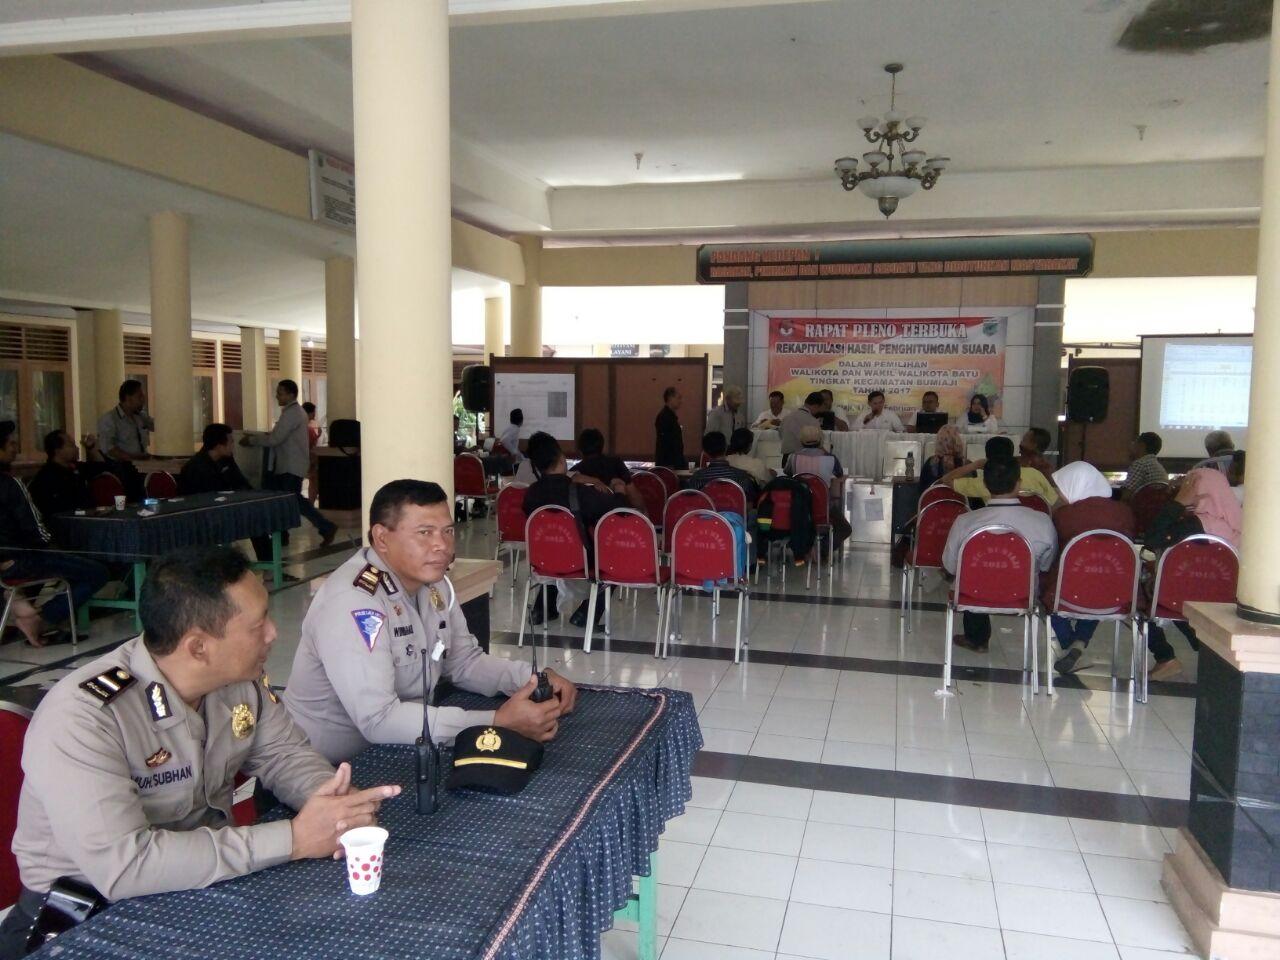 Pengamanan Rapat Pleno Terbuka Rekapitulasi Perhitungam Suara Tingkat Kecamatan